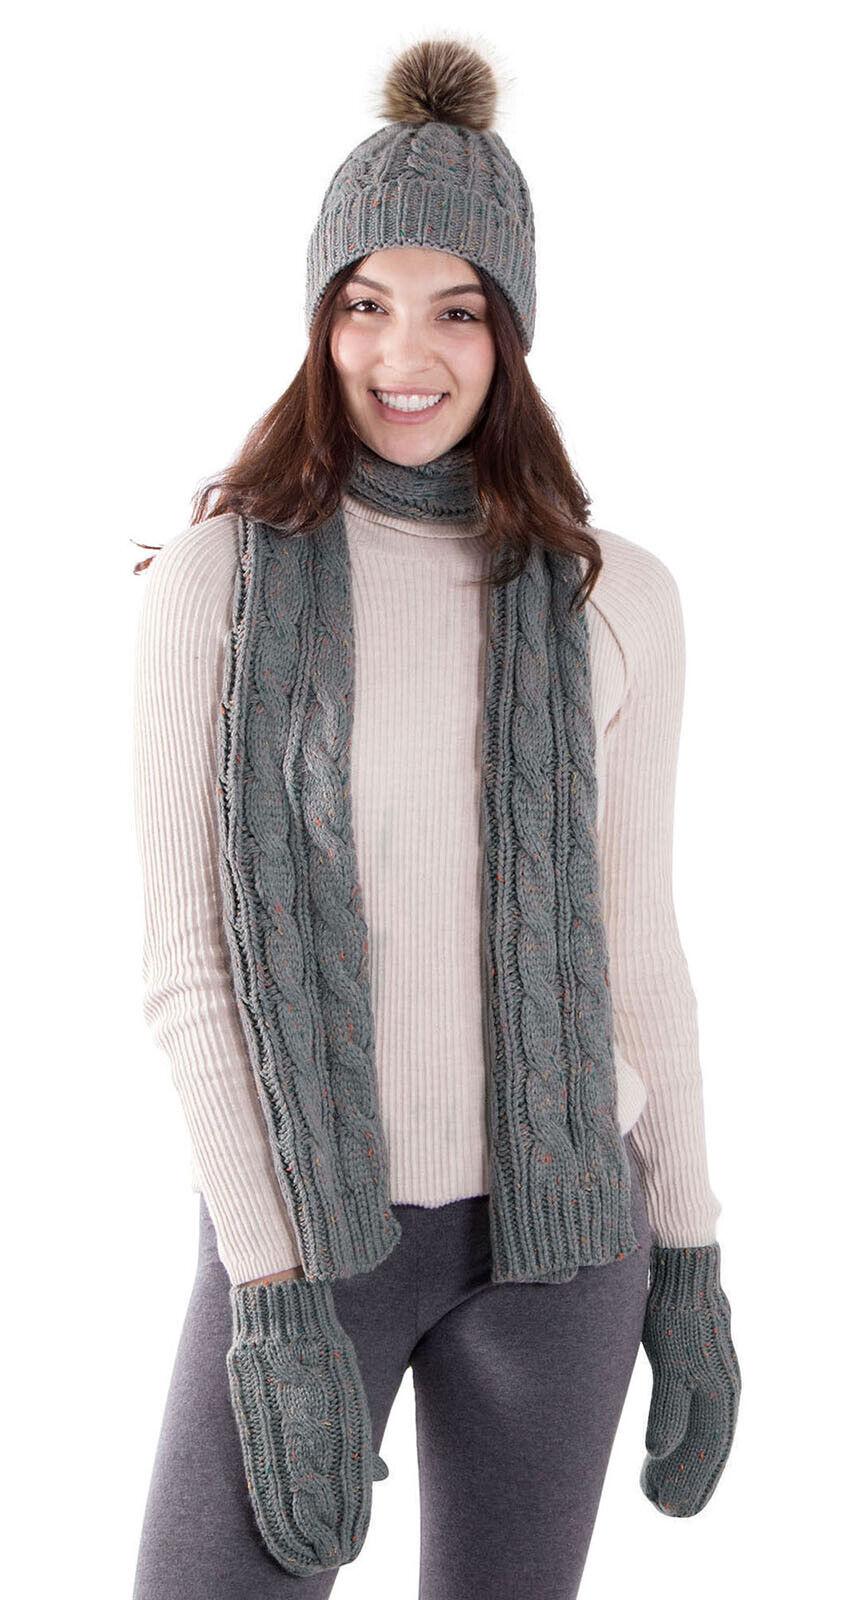 Adult Women Men Warm Set Winter Set Beanie Hat Cap Scarf Glo